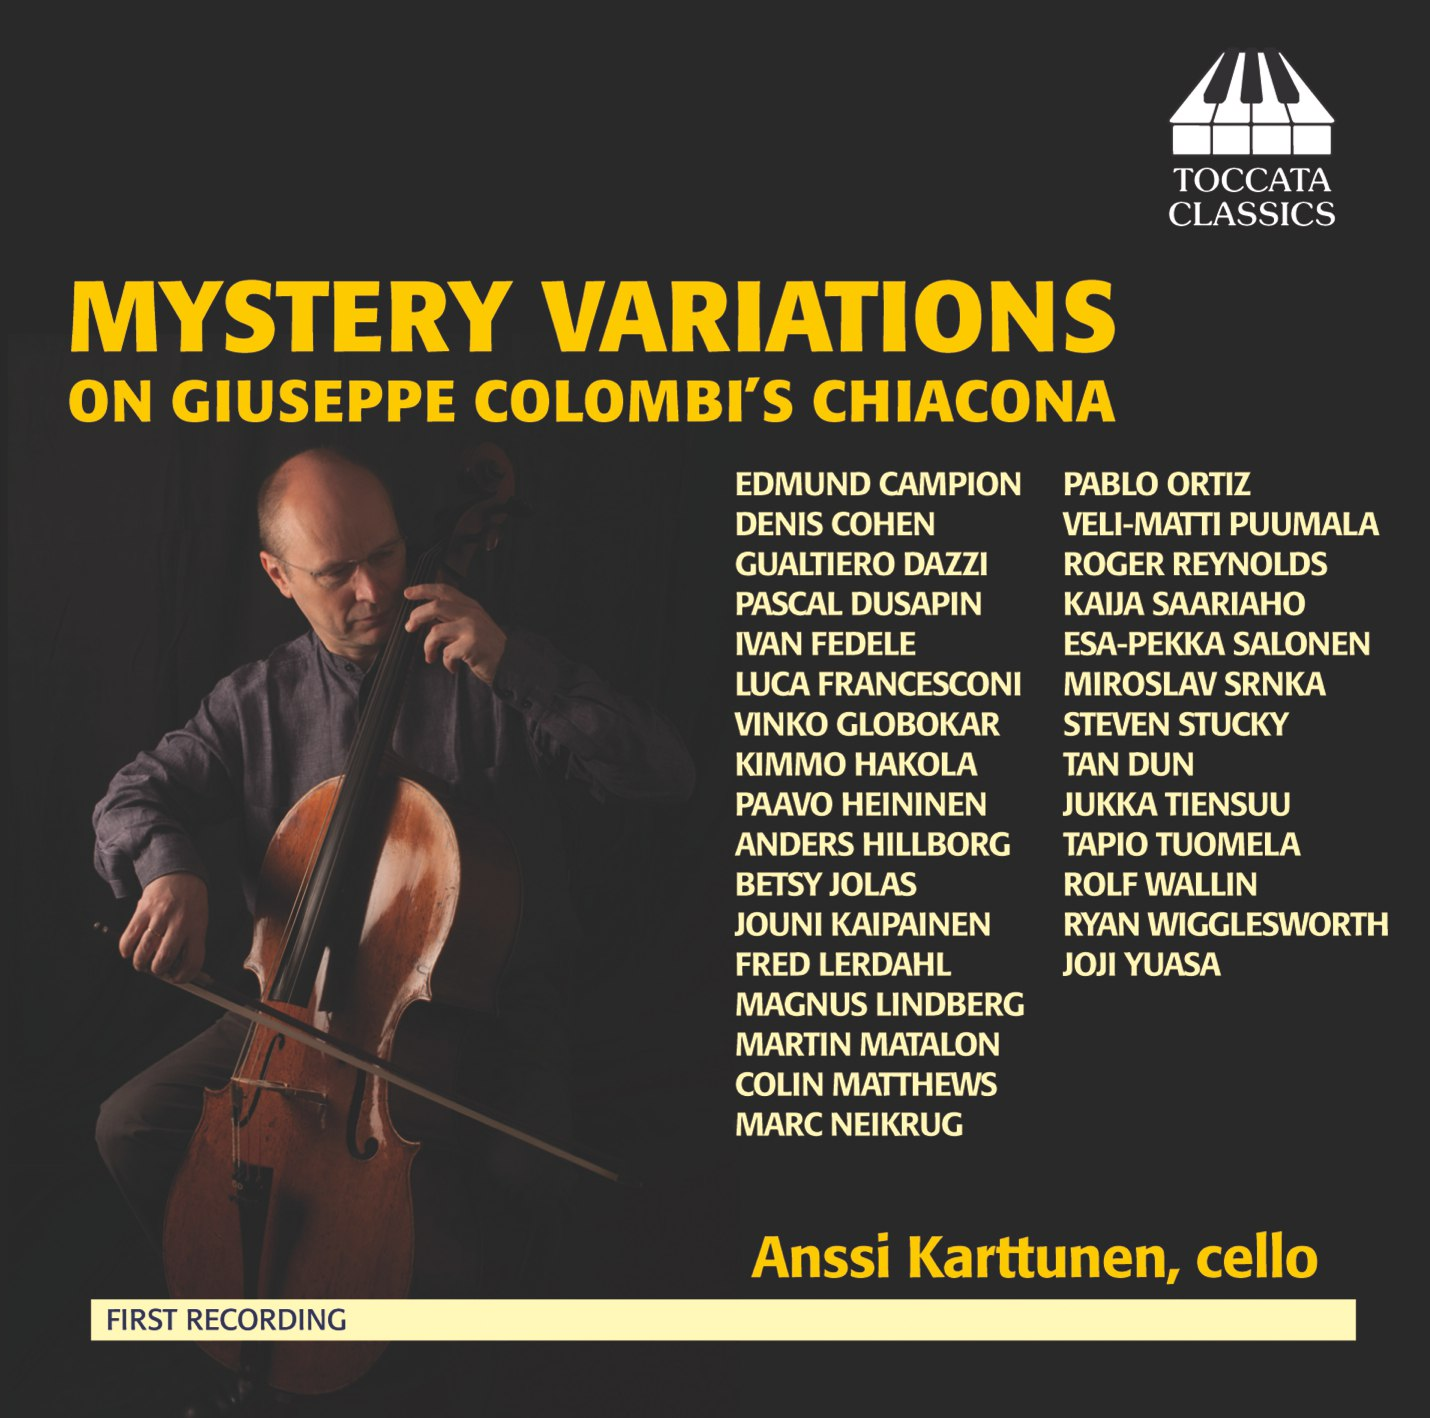 Mystery Variations on Giuseppe Colombi's Chiacona